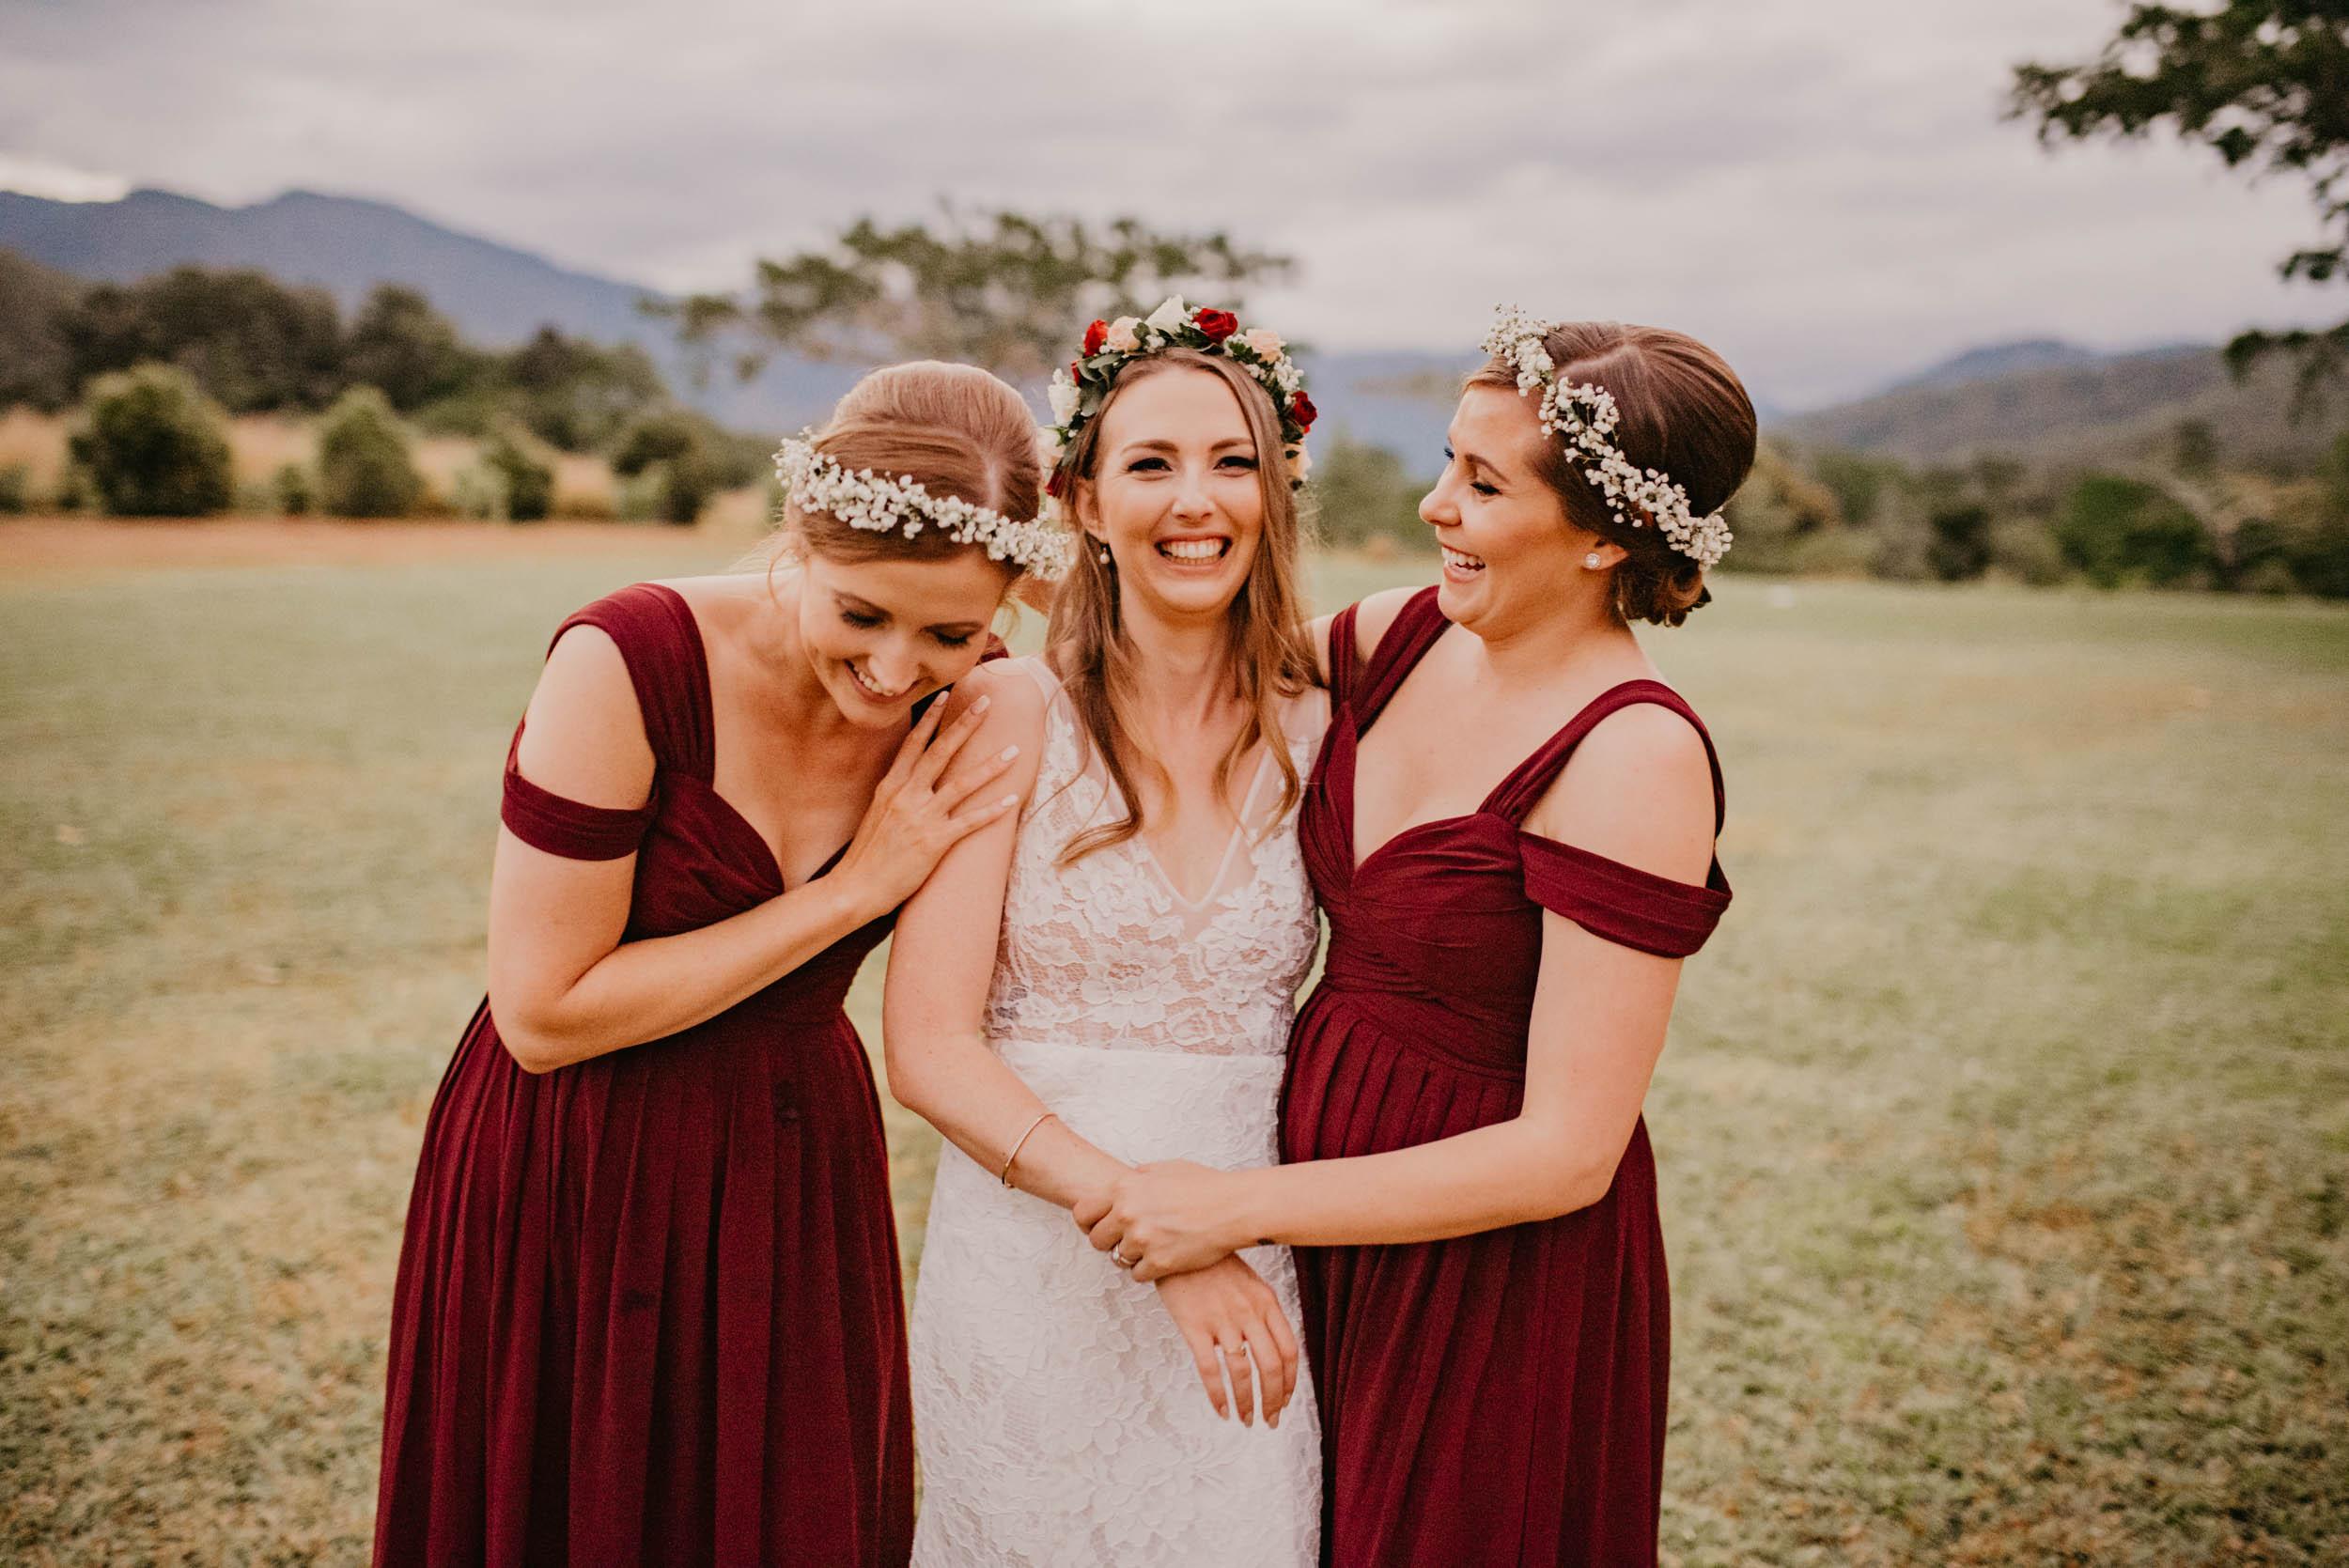 The Raw Photographer - Cairns Wedding Photographer - Laloli - Cairns Garden Ceremony - Cane Fields Photo Shoot-57.jpg